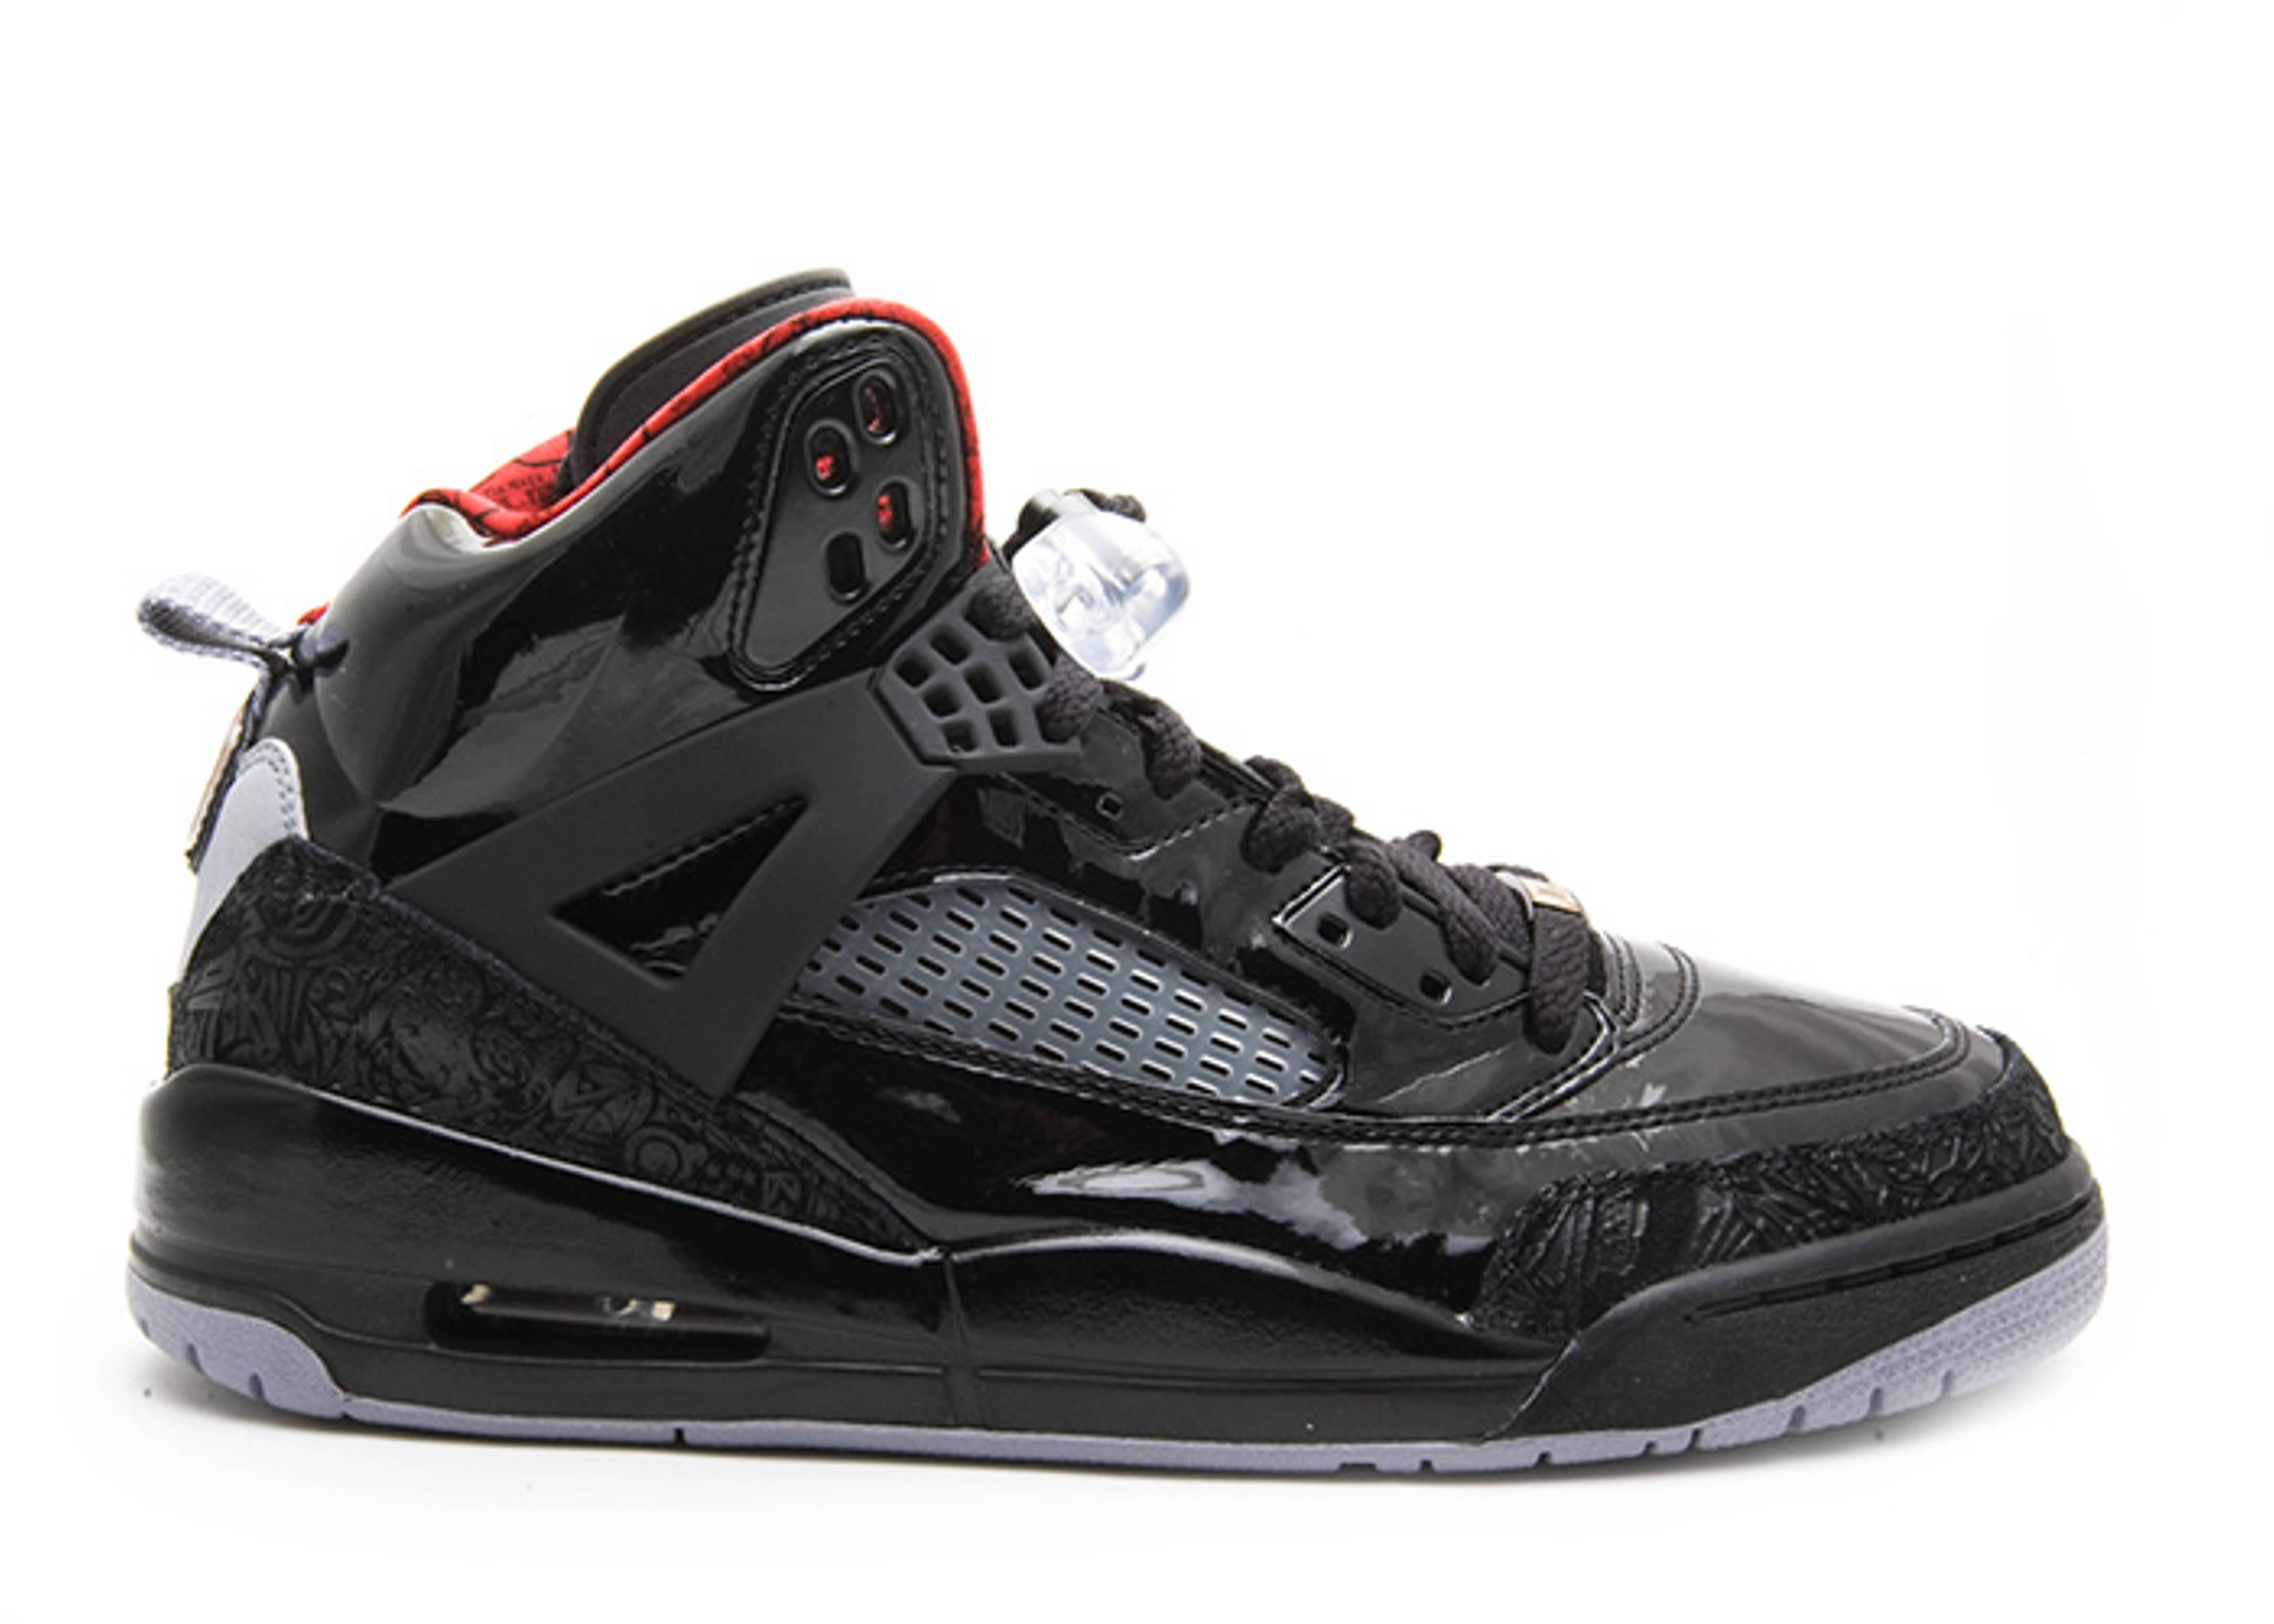 sale retailer 239b3 b0f2e Spizike Stealth For Sale images  jordan spiz ike stealth - black varsity  red-stealth ... Air ...